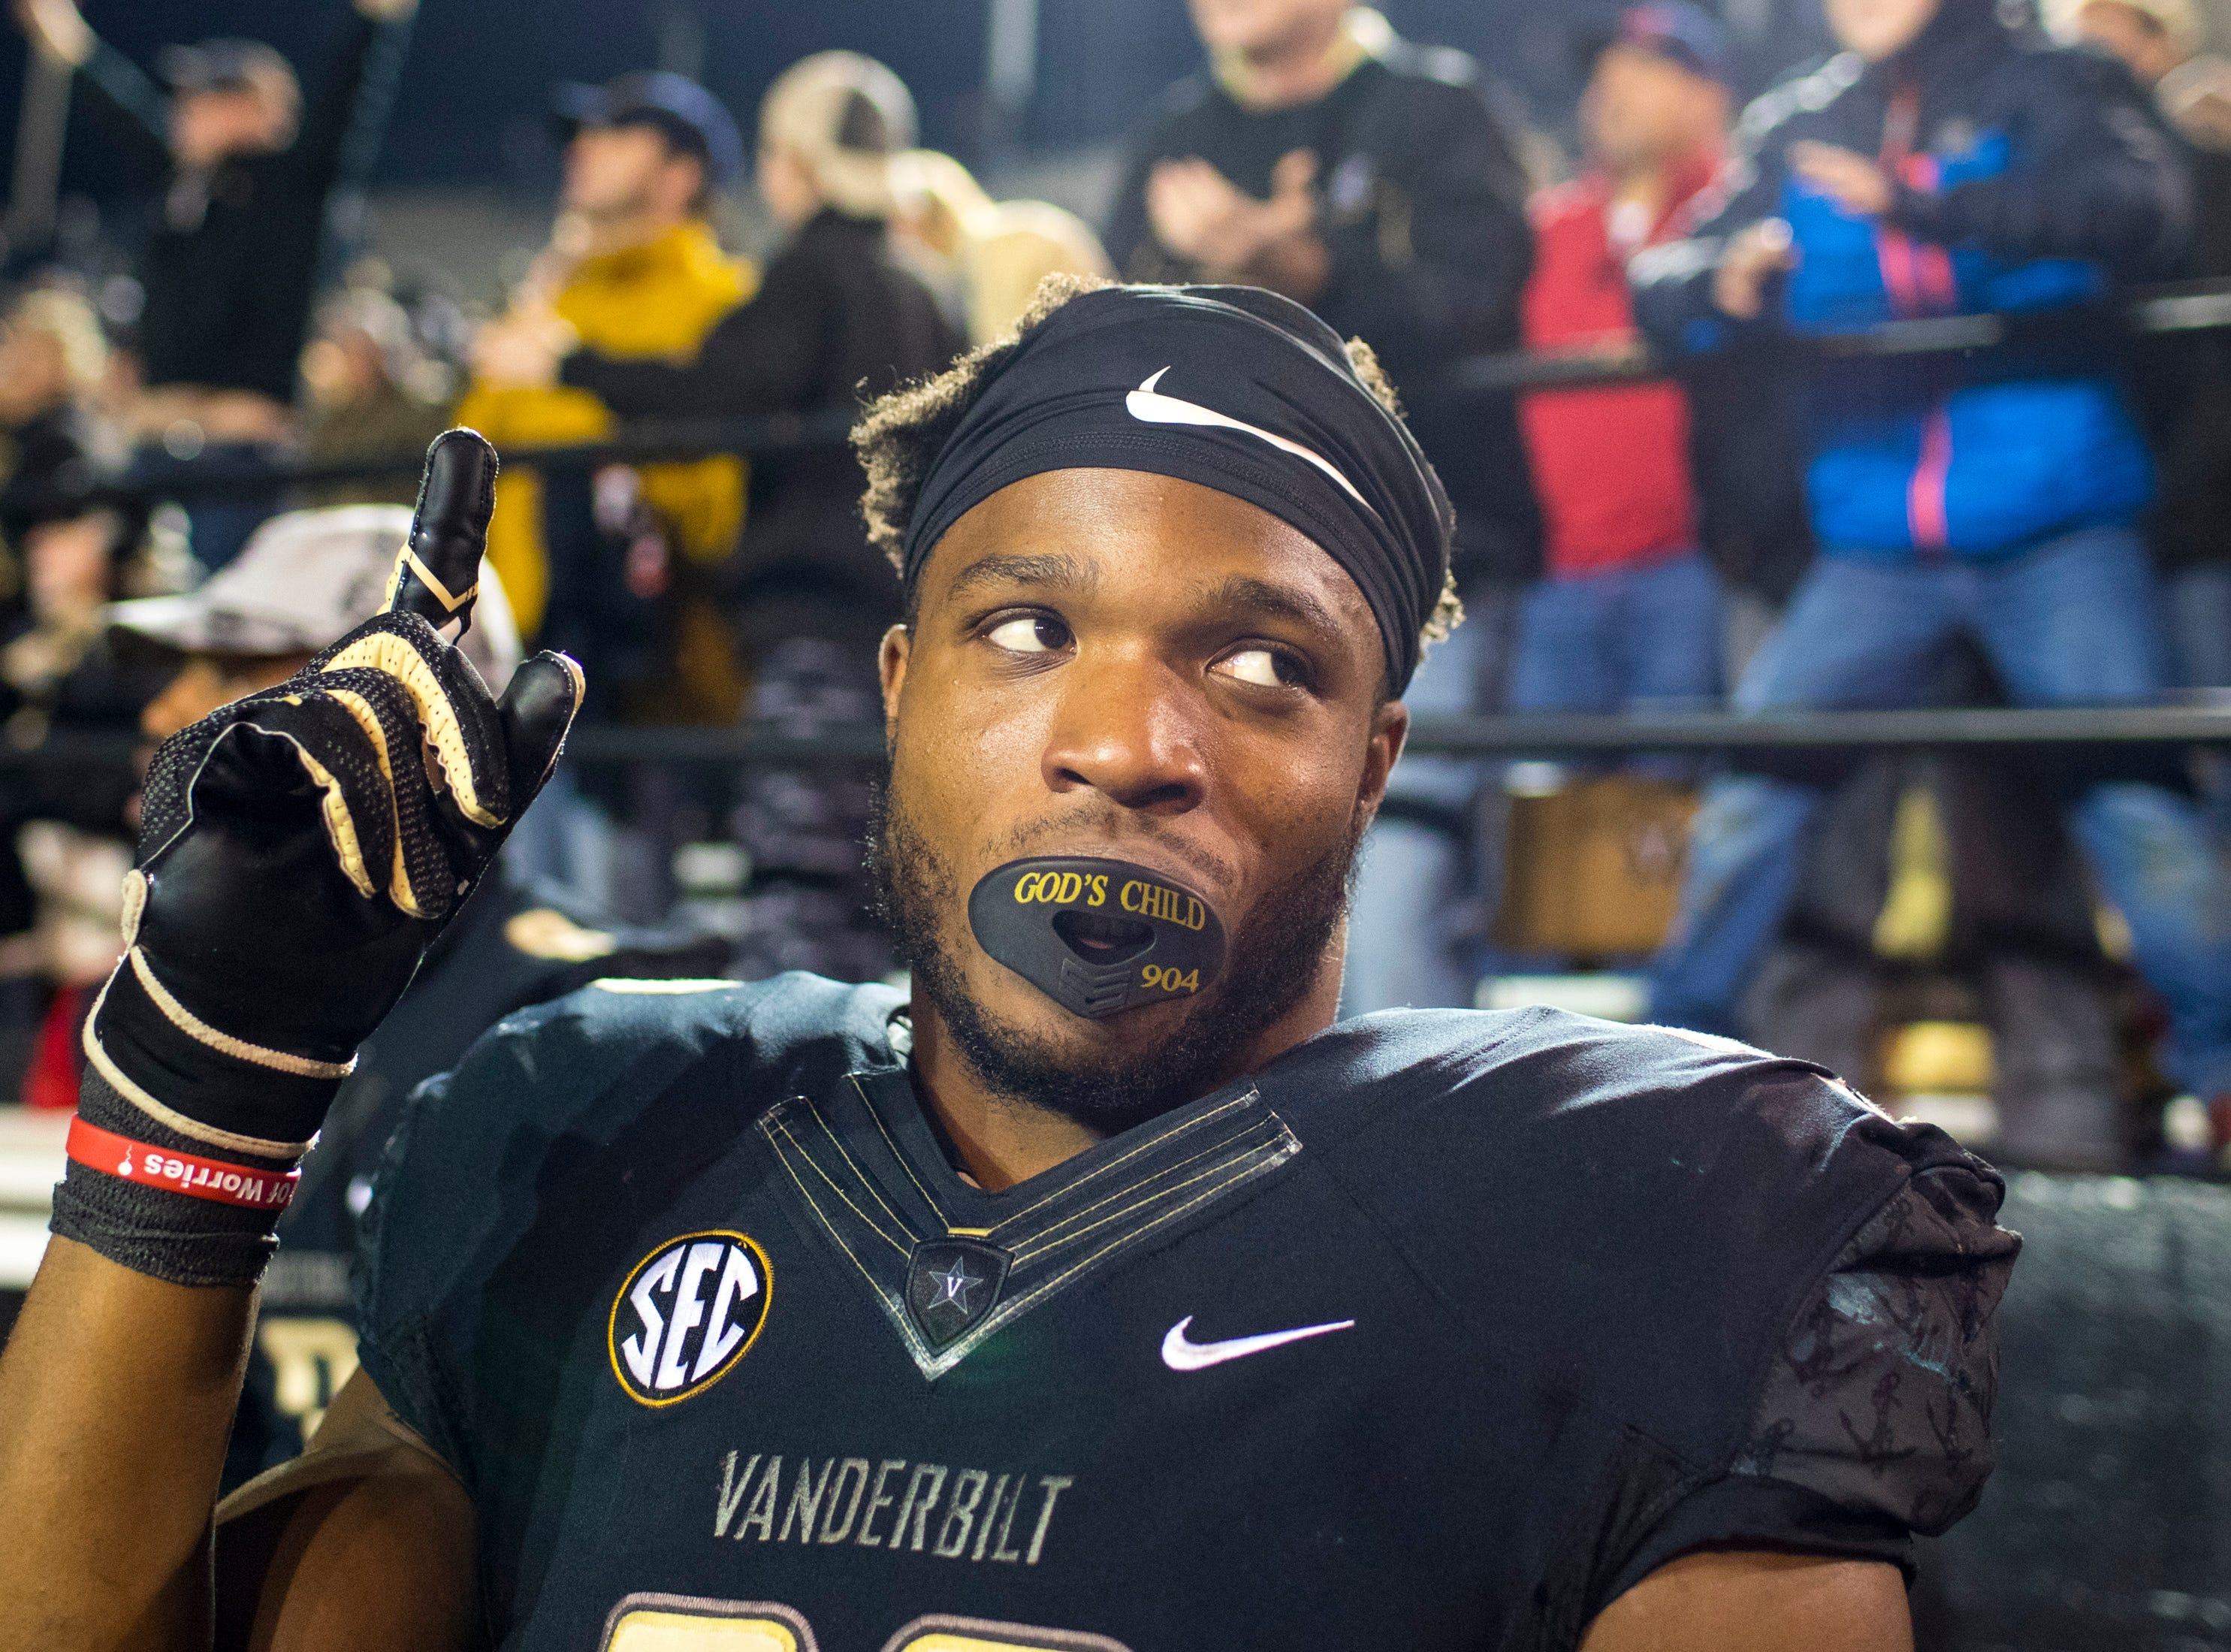 Vanderbilt running back Jamauri Wakefield (32) reacts to a call on the field during Vanderbilt's game against Ole Miss at Vanderbilt Stadium in Nashville on Saturday, Nov. 17, 2018.